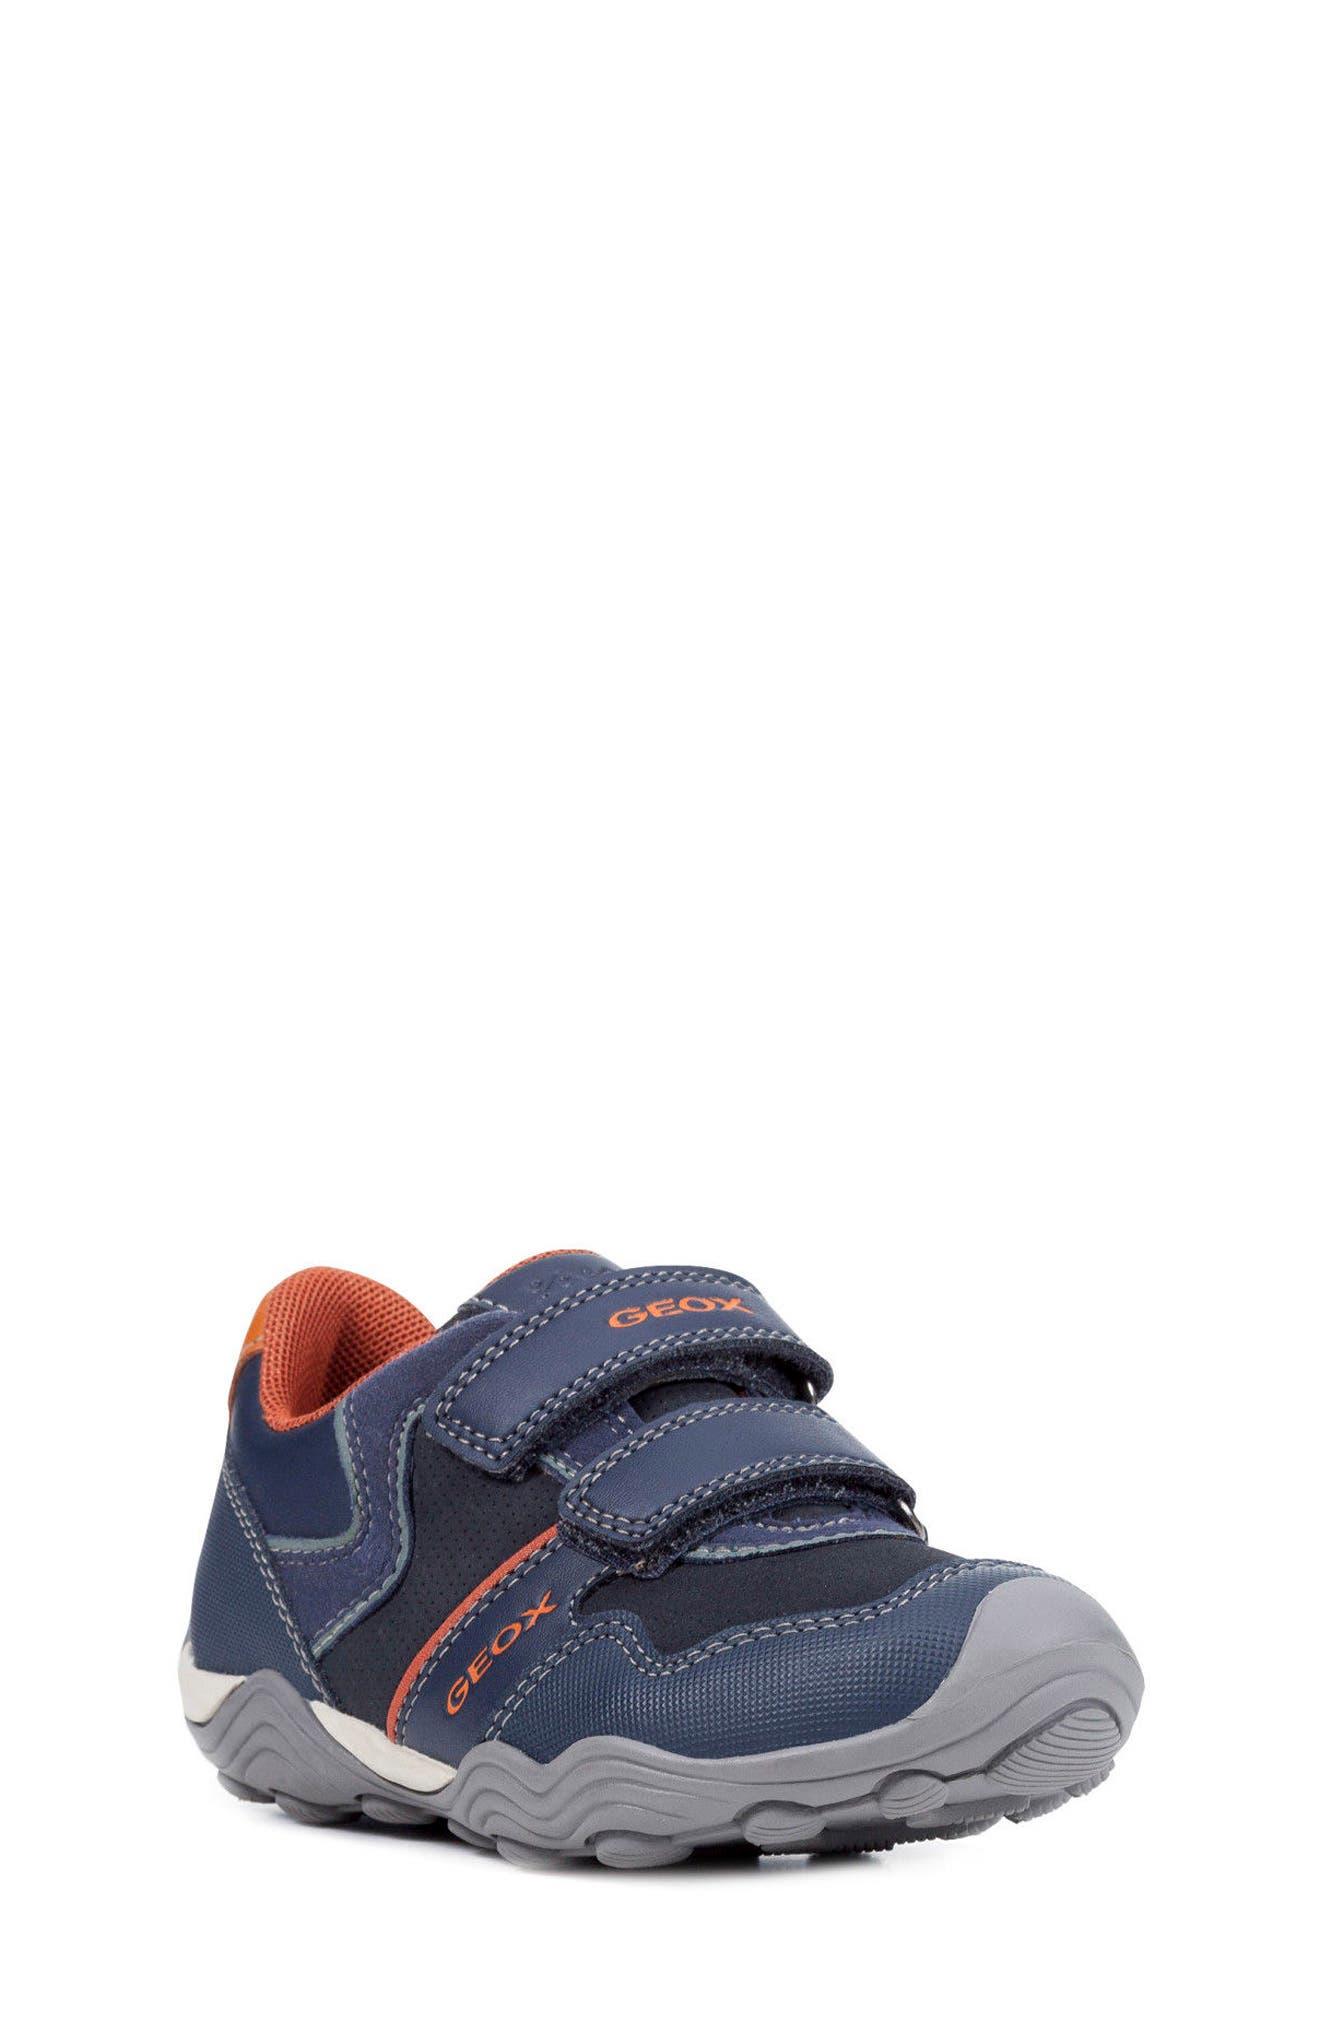 Jr Arno 13 Sneaker,                             Main thumbnail 1, color,                             NAVY/ DARK ORANGE